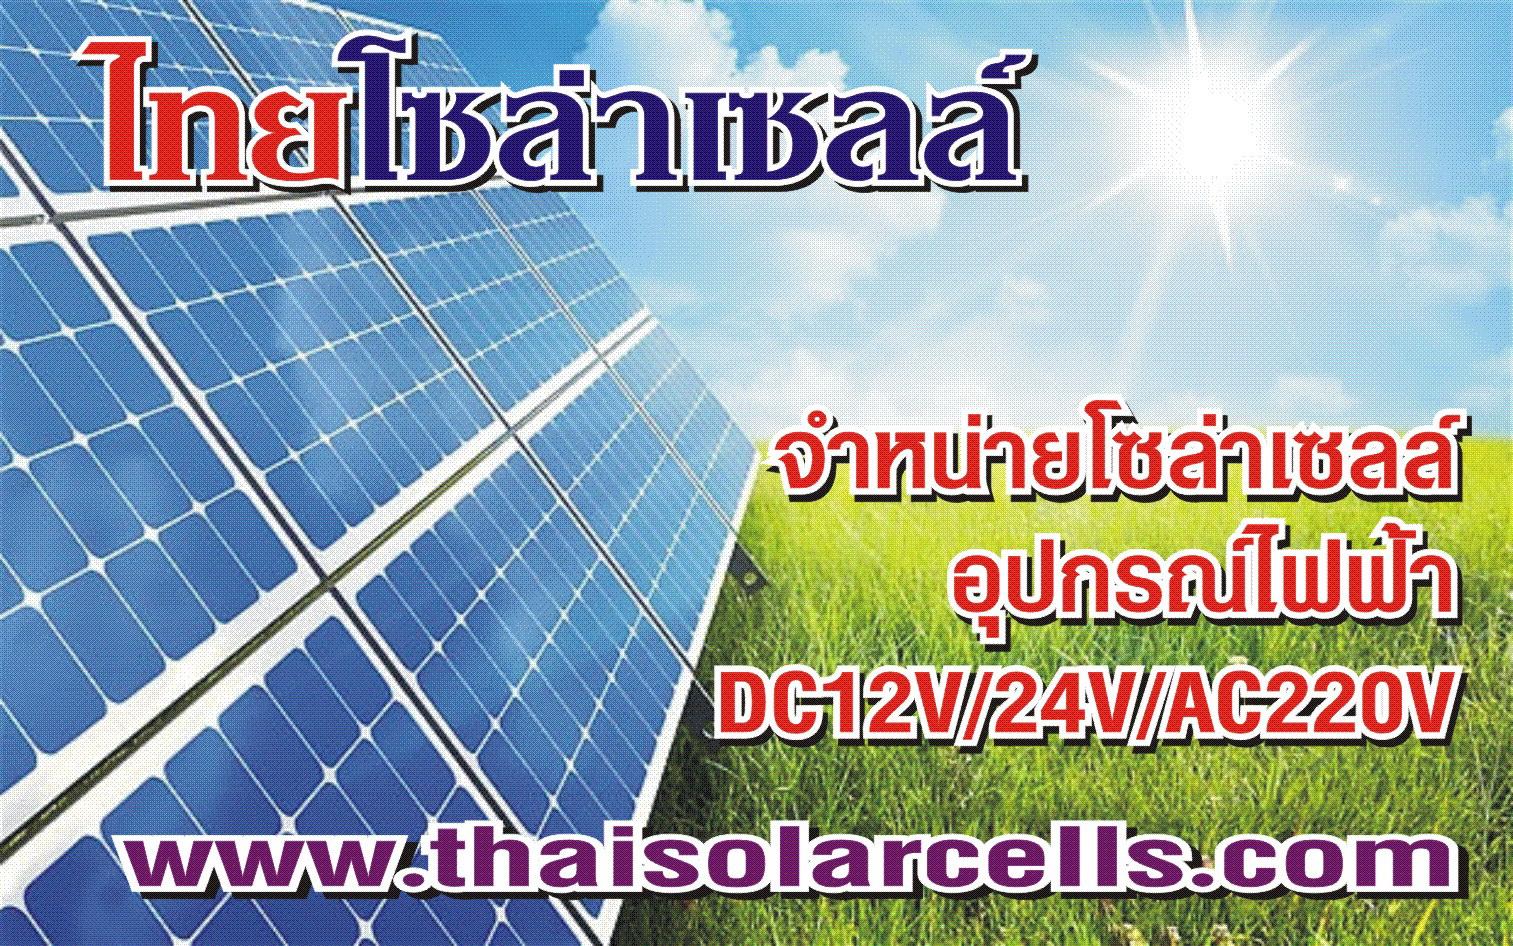 http://www.thaisolarcells.com